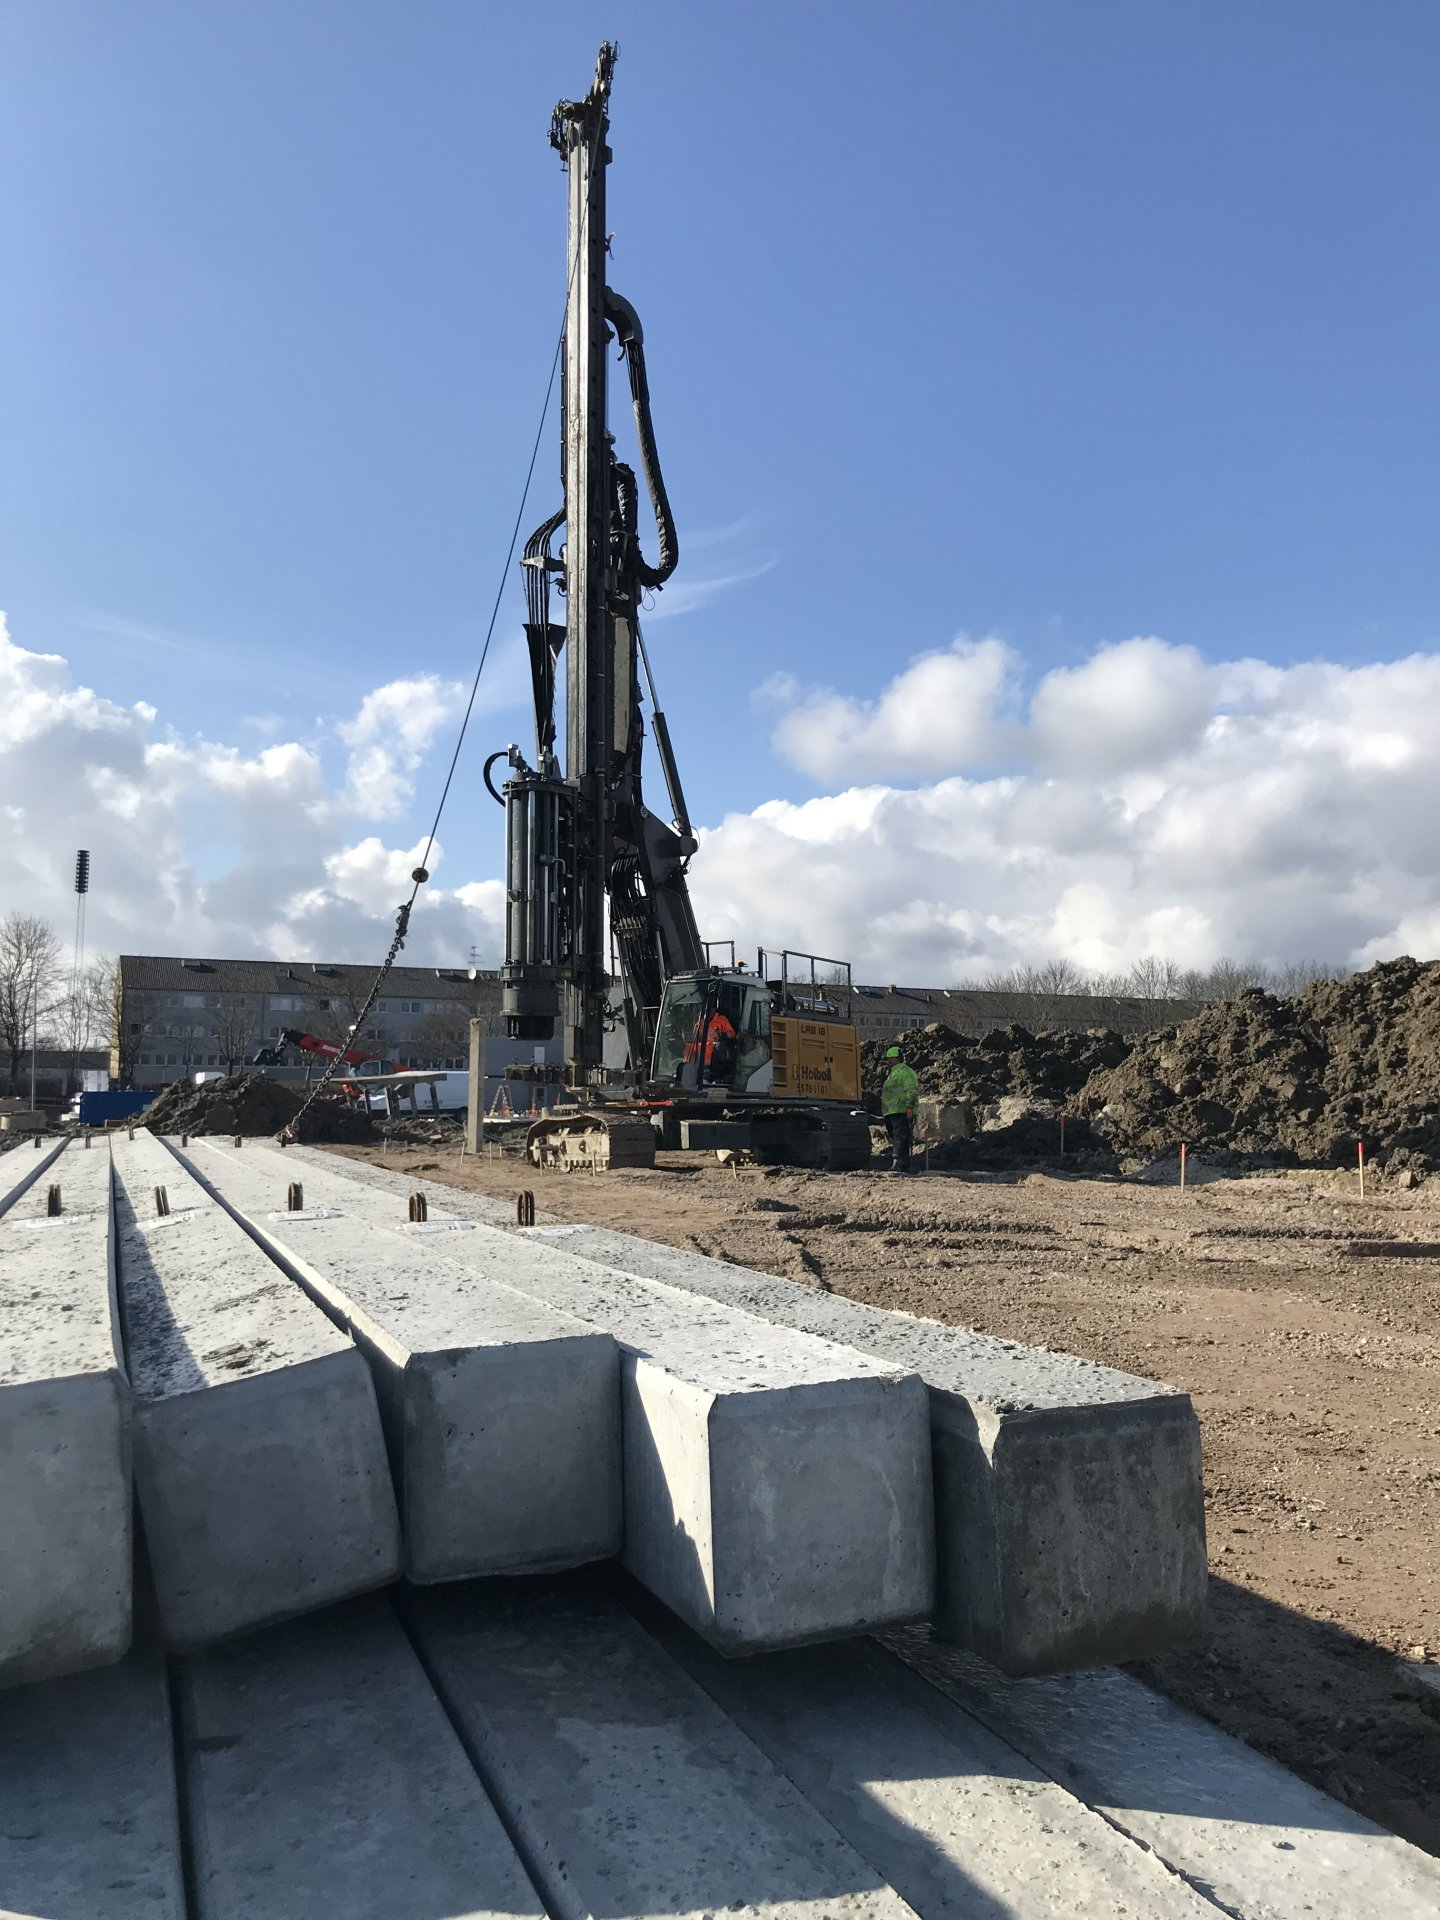 Albertslund | Nyt boligområde | Holbøll banker pæle til fundament